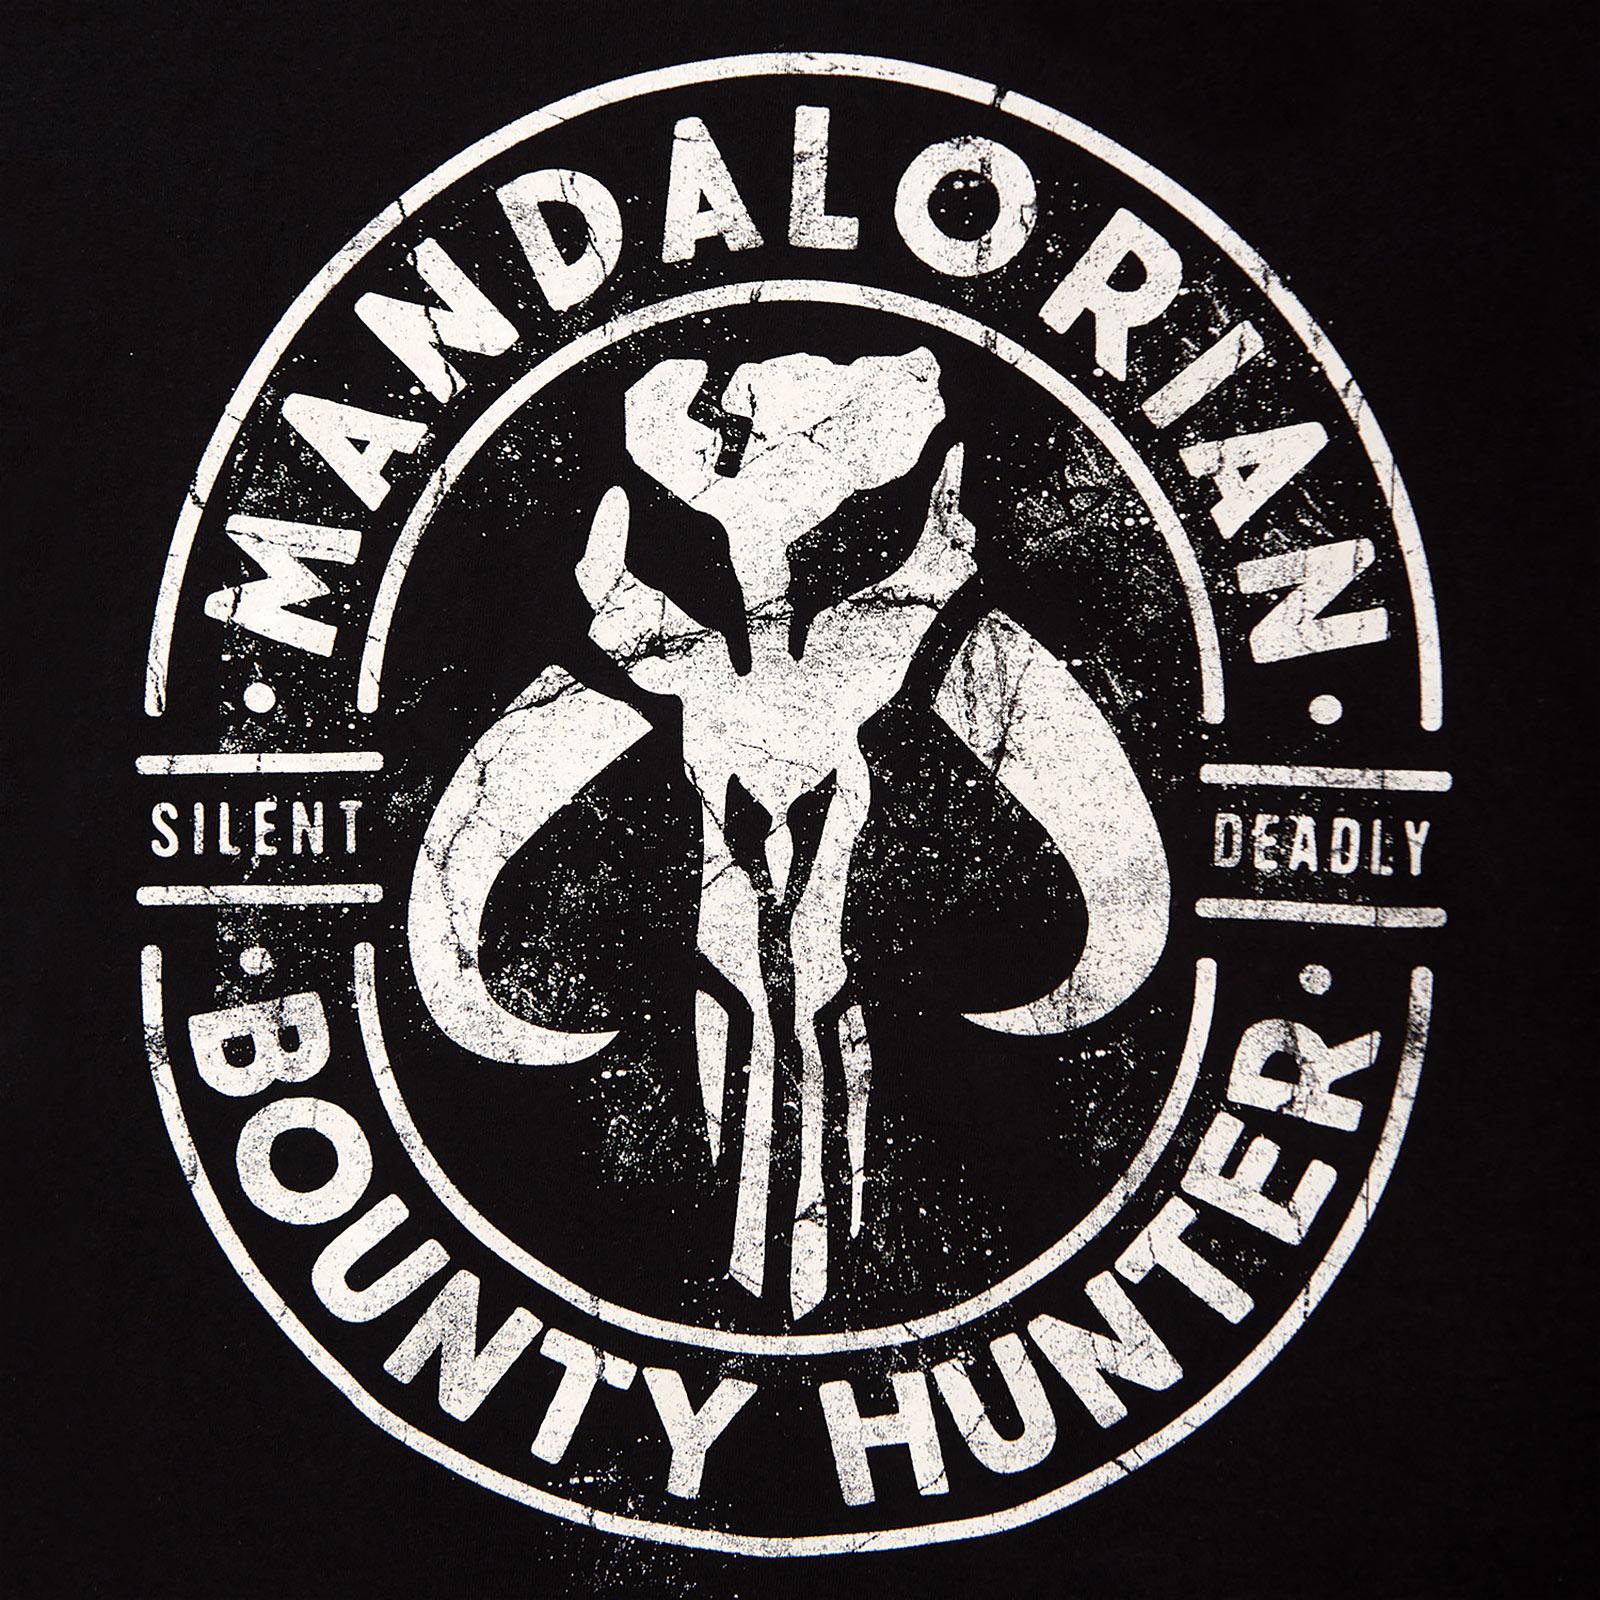 Code of Honor T-Shirt schwarz - Star Wars The Mandalorian